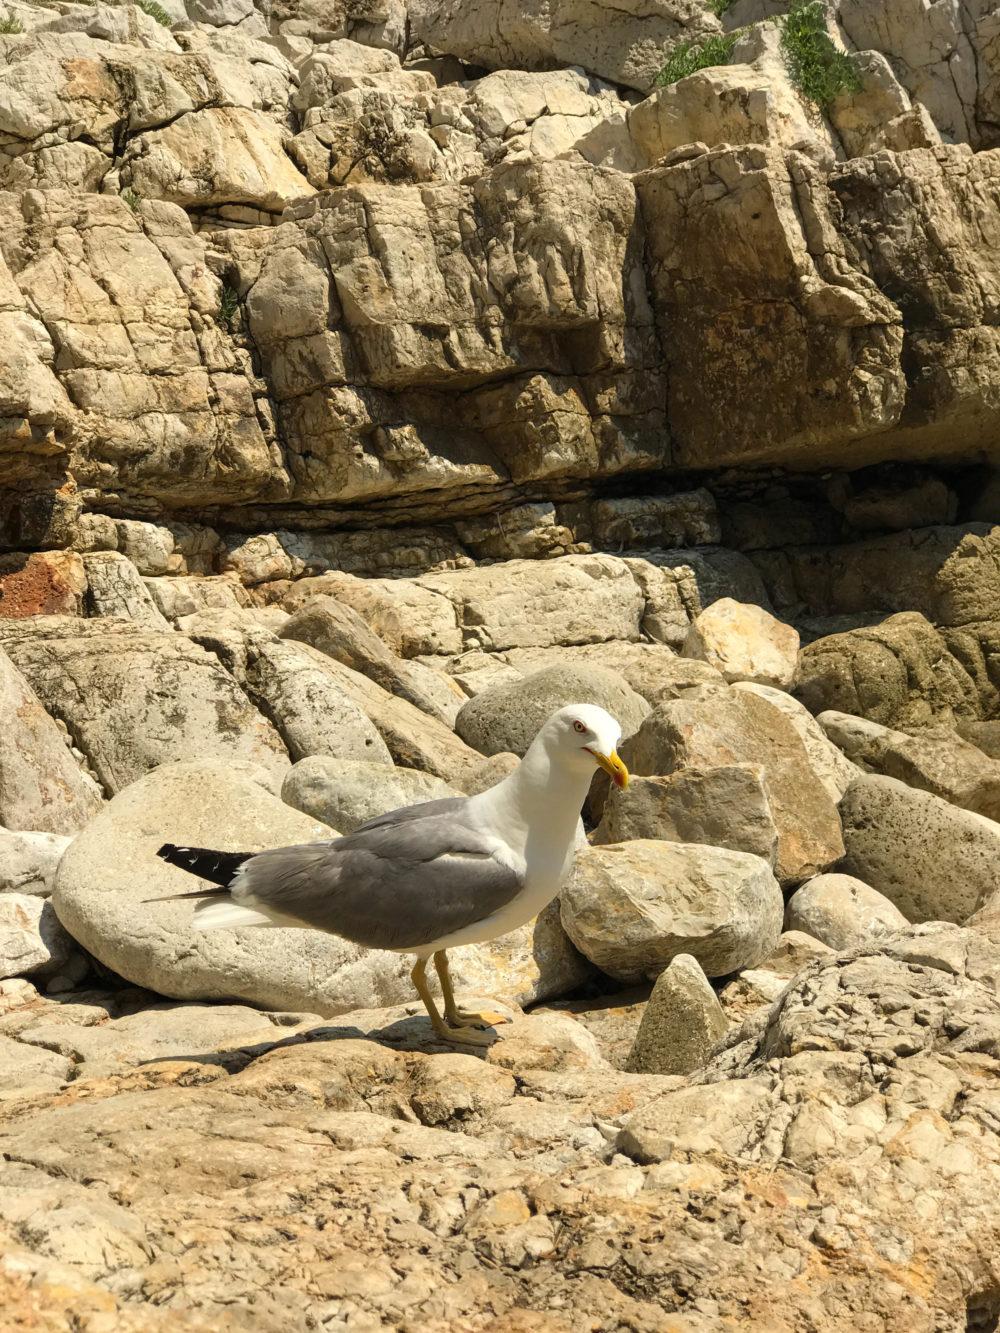 goeland plage cap d'antibes sentier du littoral